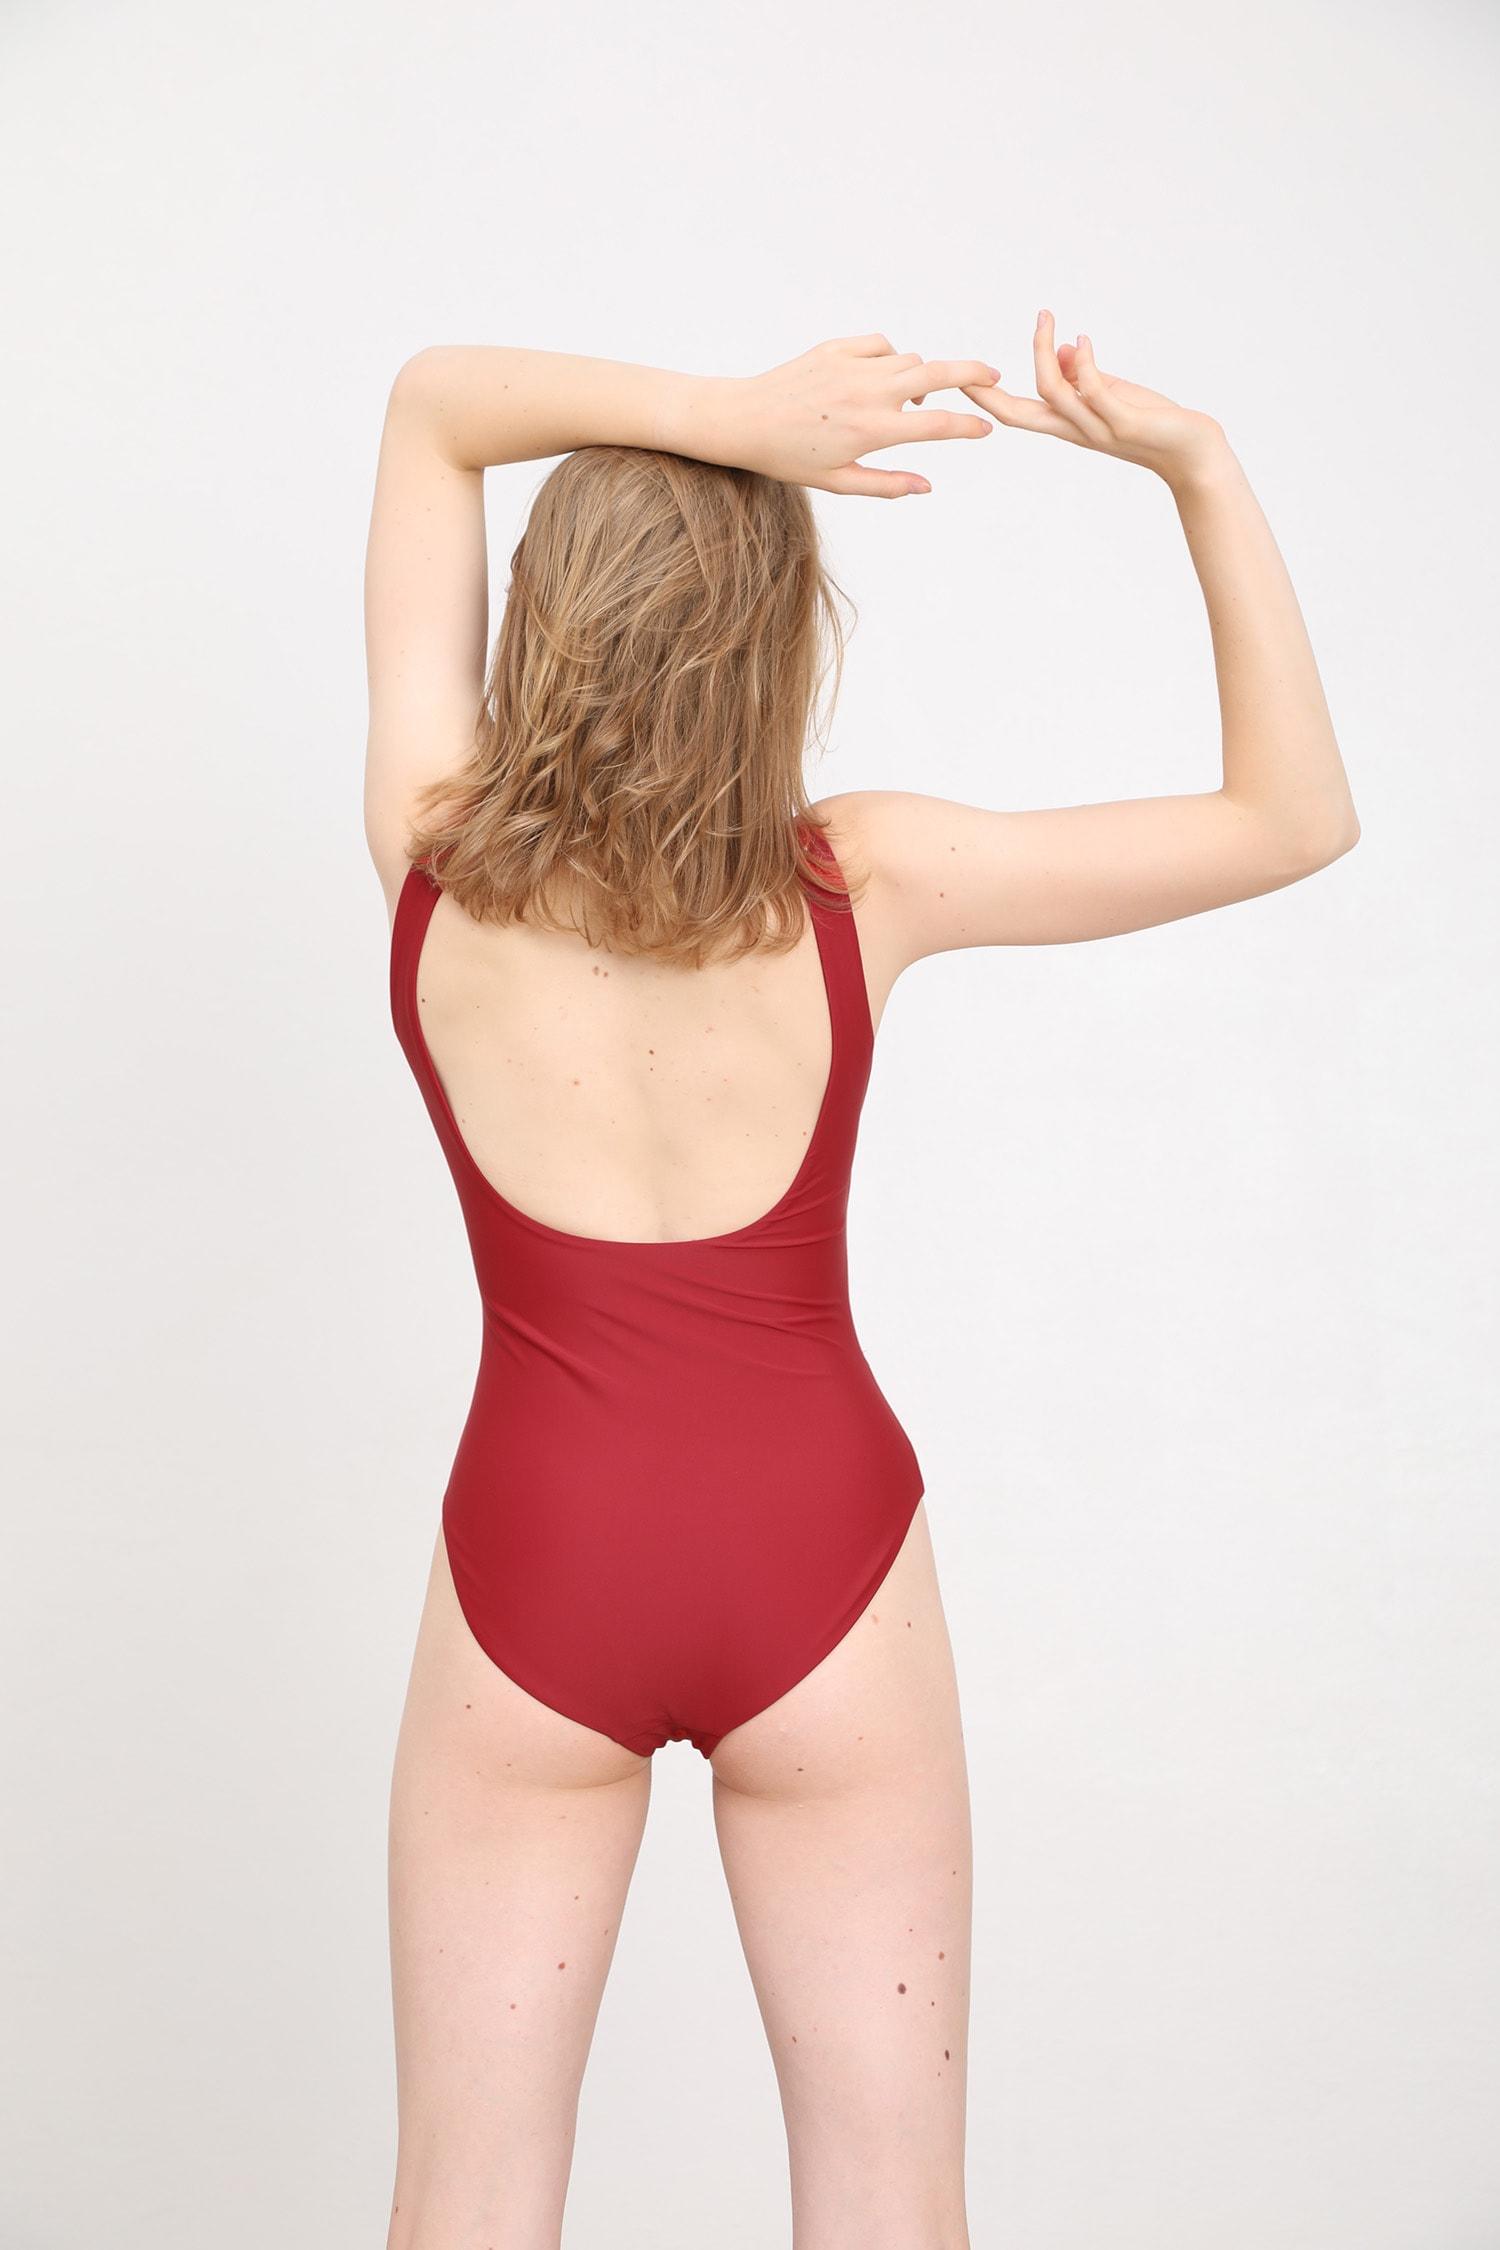 margaret and hermione_ss19_swimsuit no5_dark red_159,00eur_hinten_online